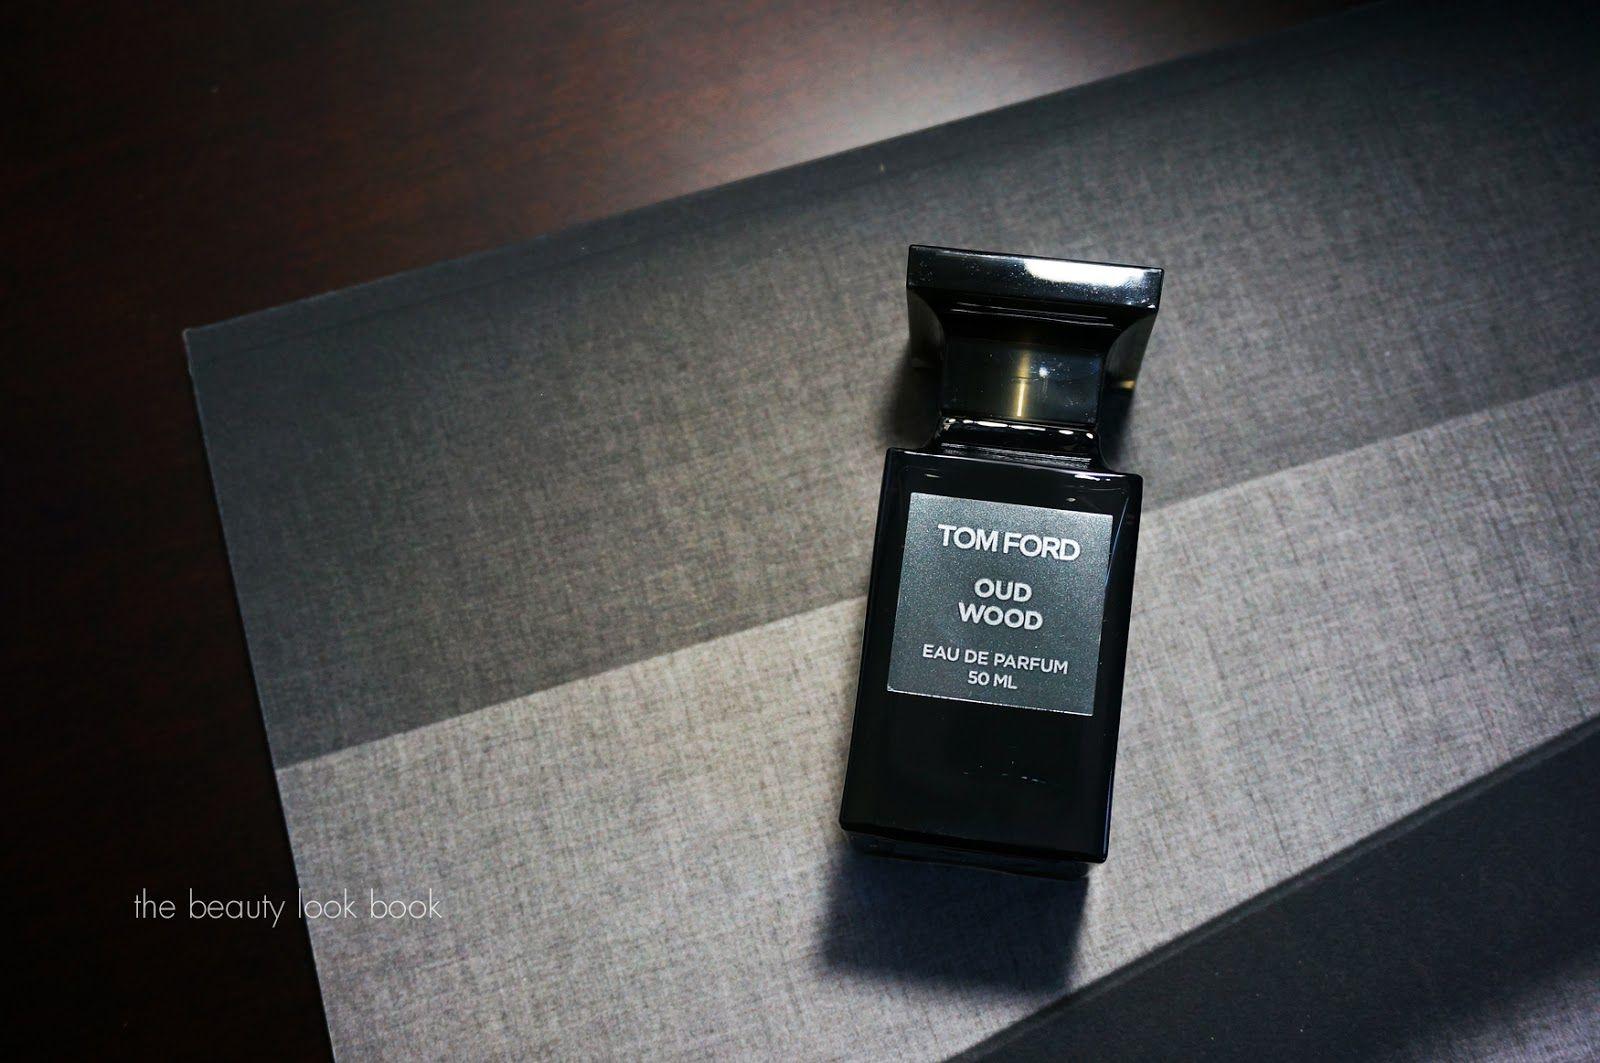 Tom+Ford+Oud+Wood.jpg (1600×1063)